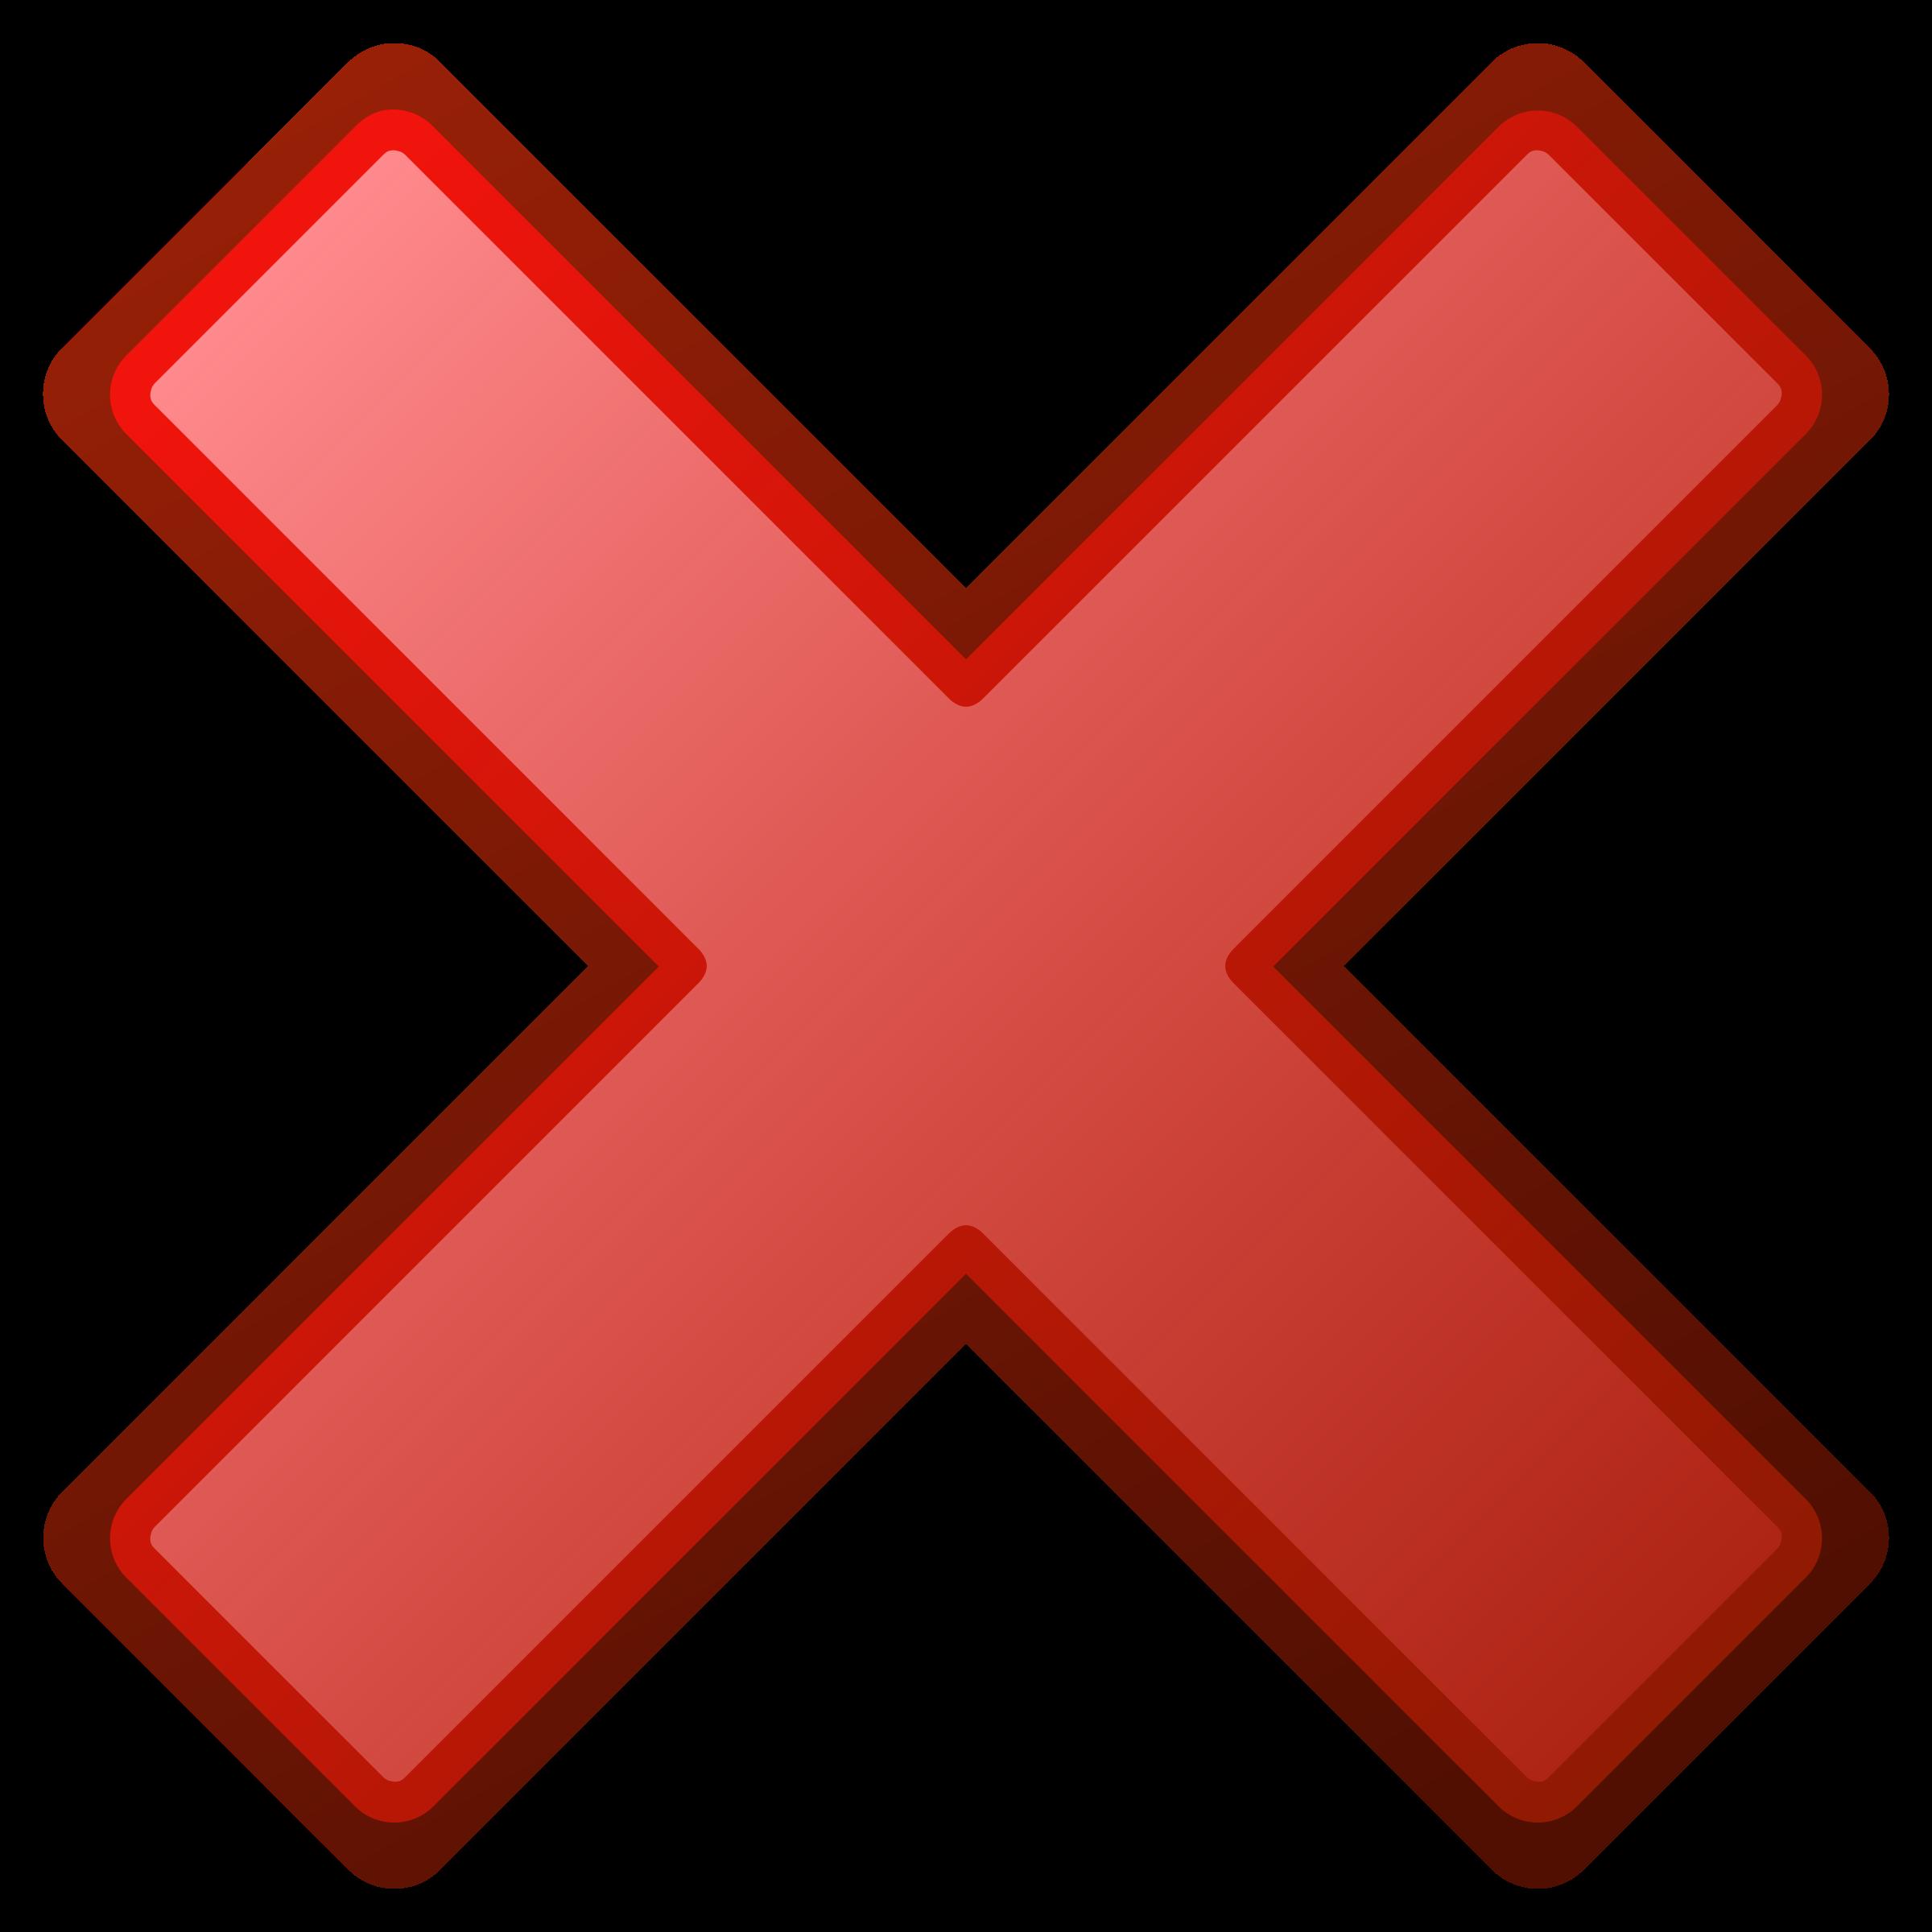 . Clipart cross logo